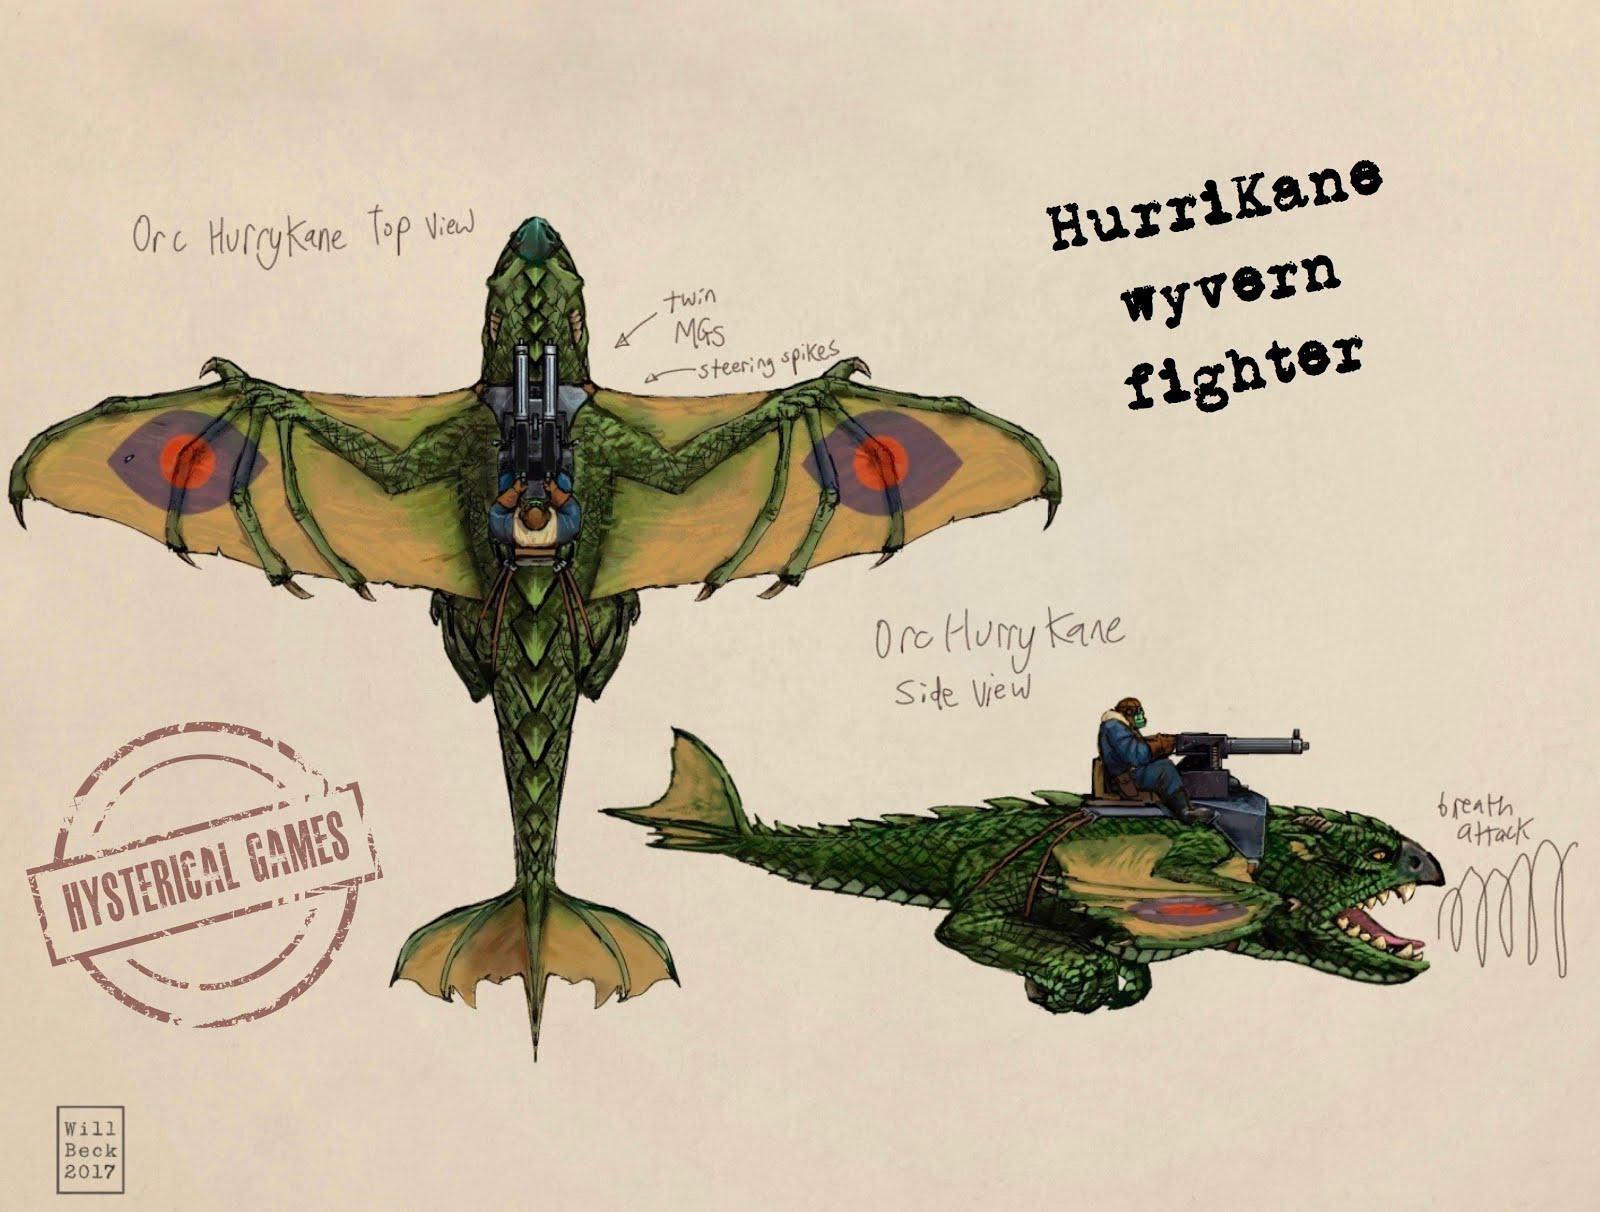 Spitfyre KS002 HurriKane